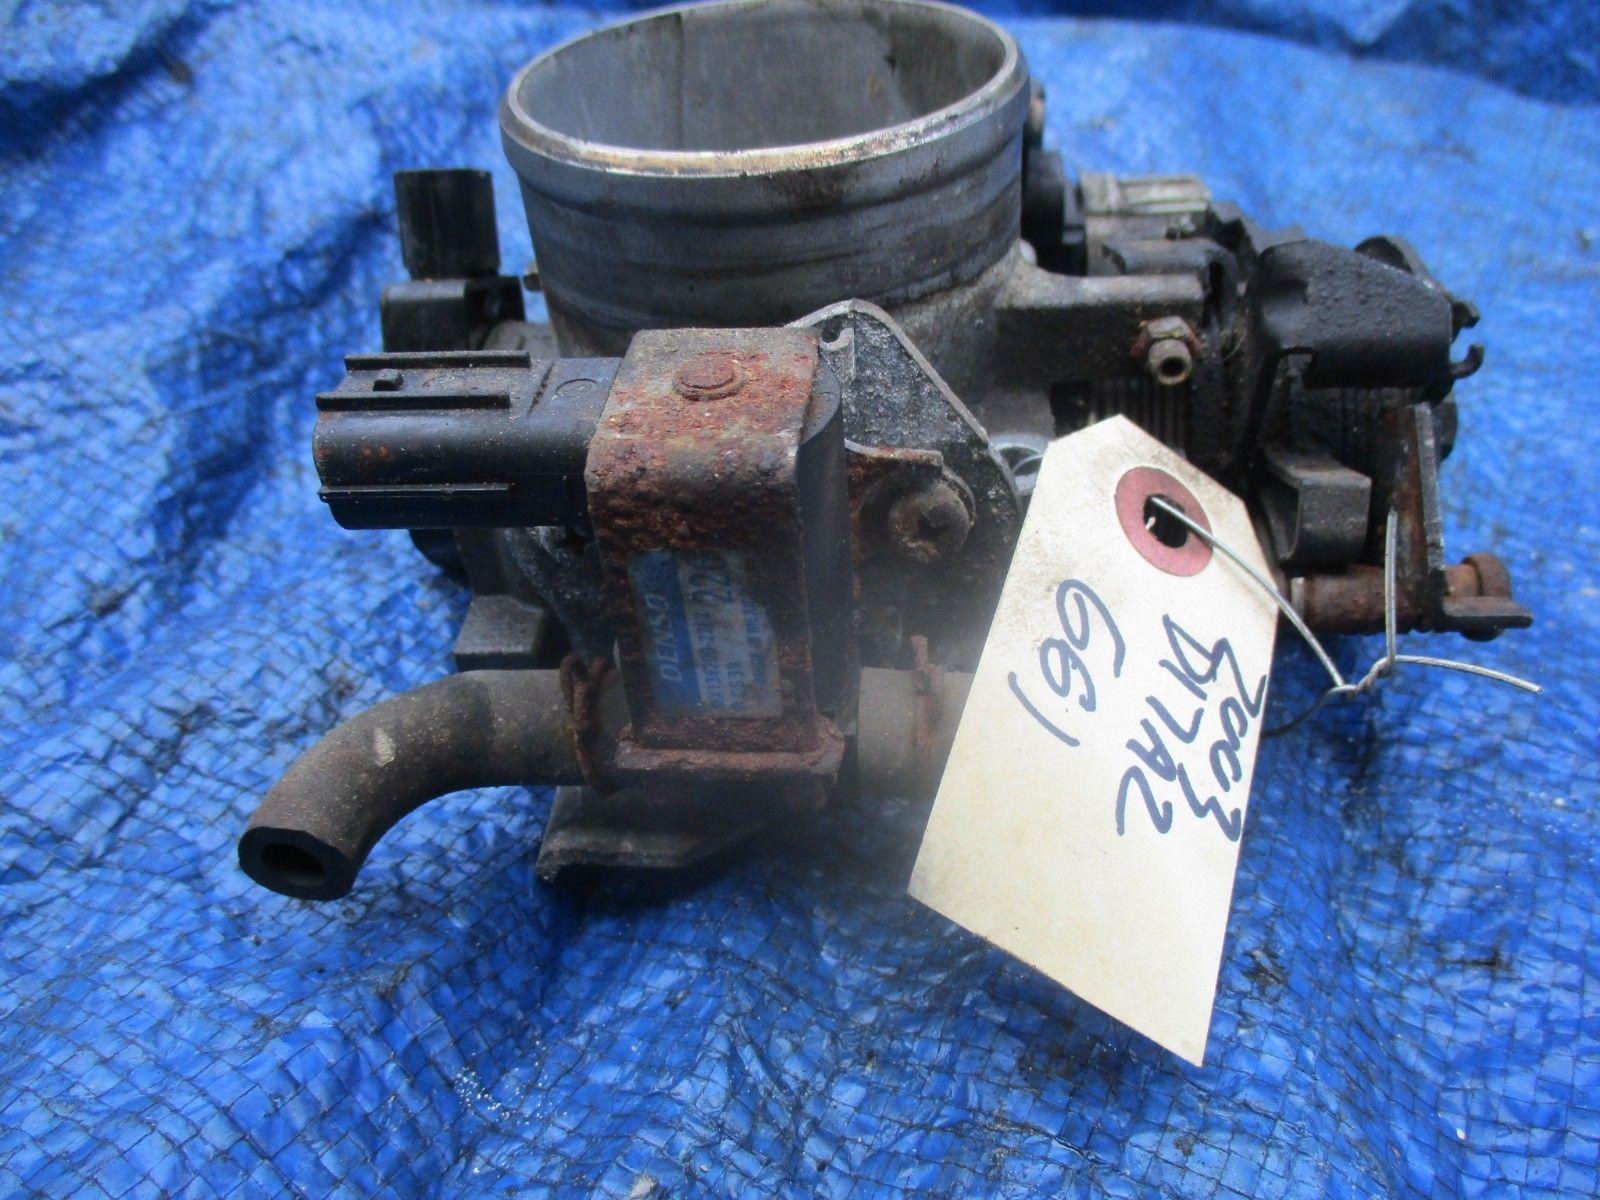 01-05 Honda Civic D17A2 VTEC throttle body engine motor D17 D17A1 SOHC OEM TPS